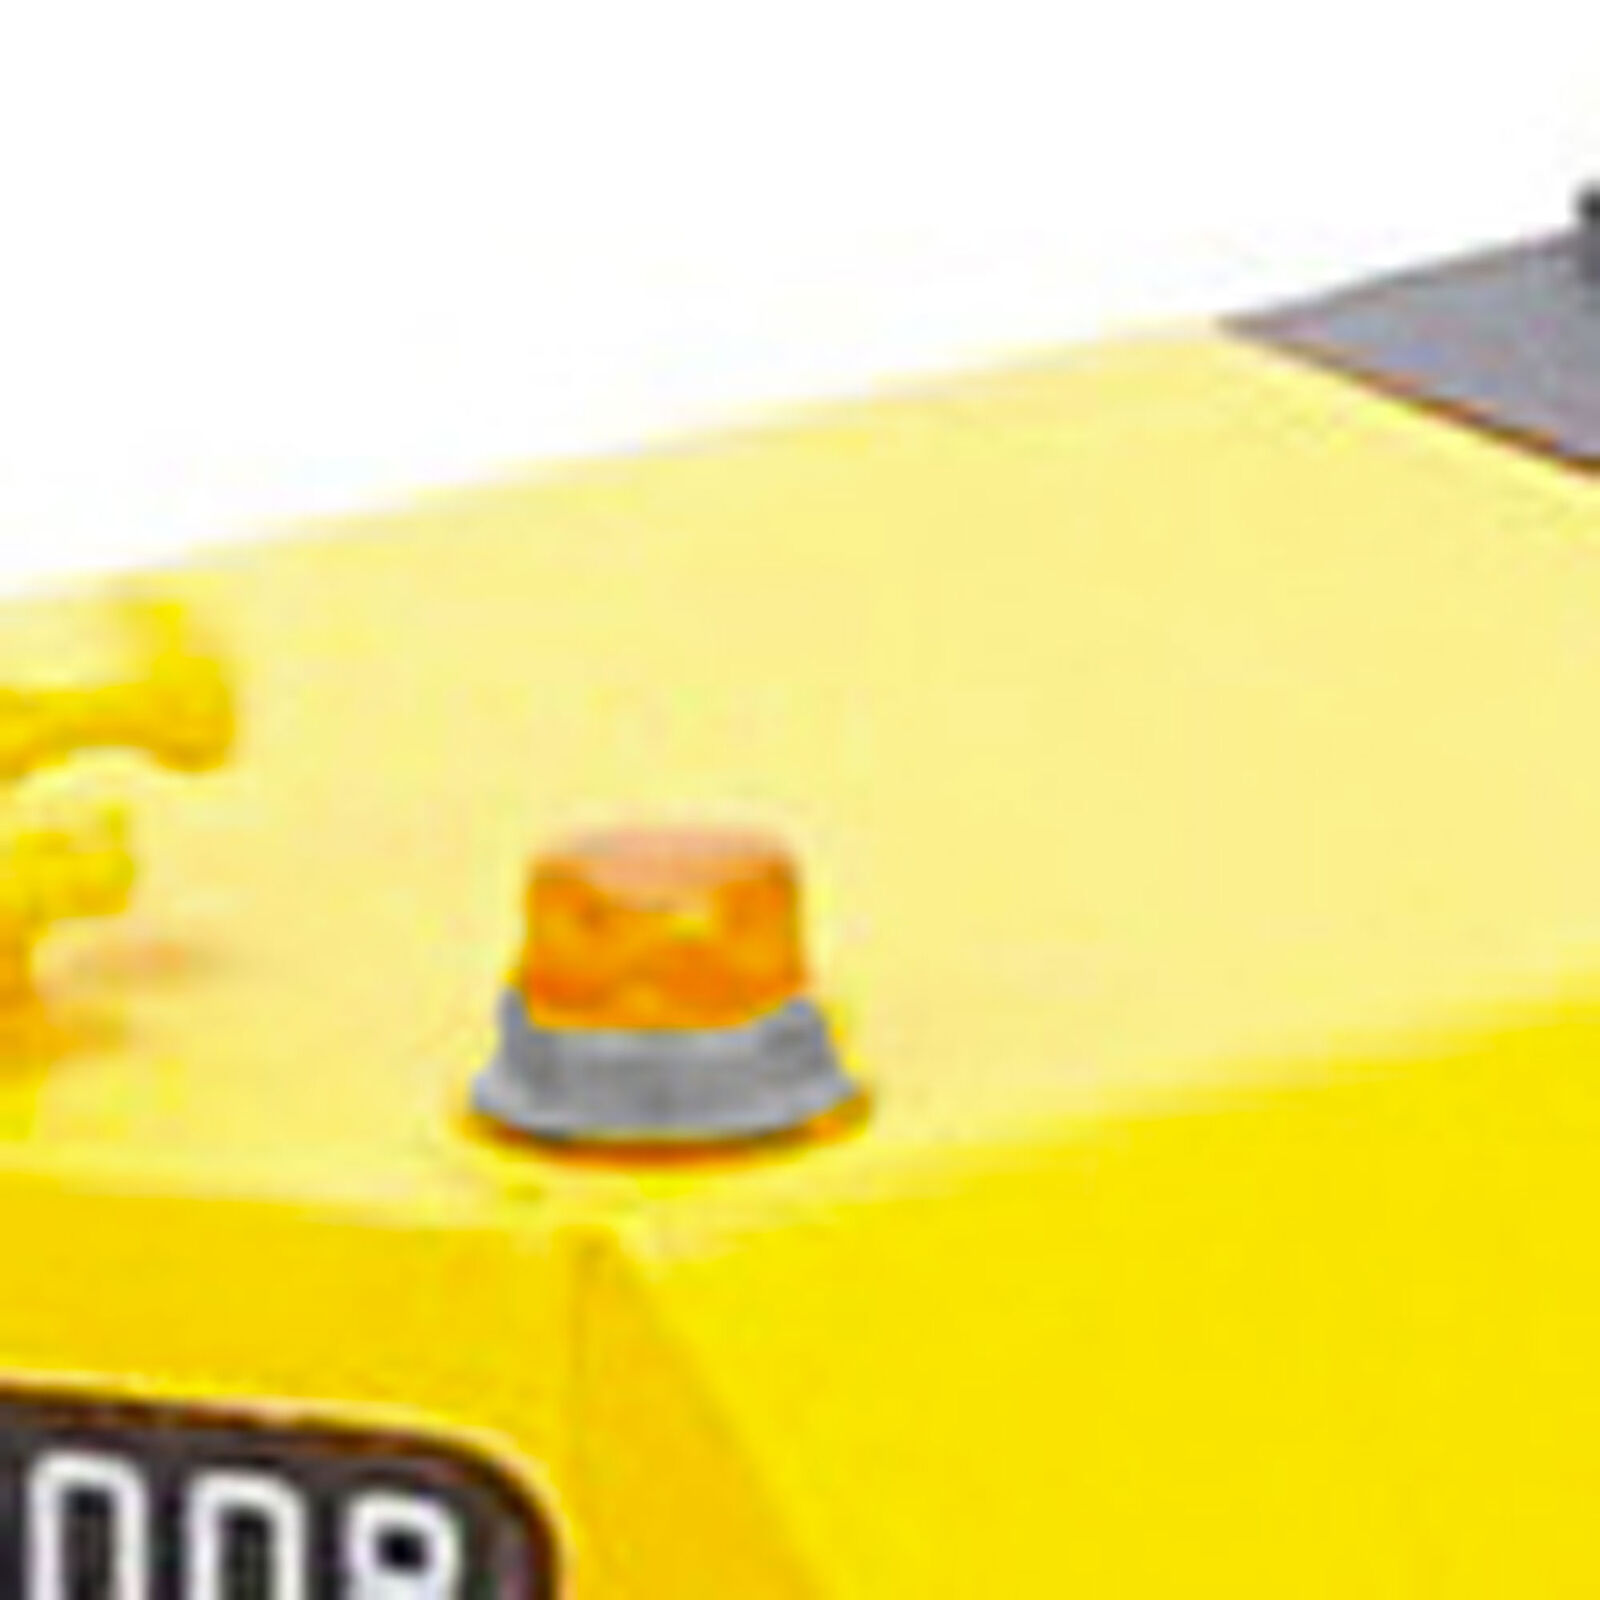 HO Prime 8911 Stratolite Beacon Set